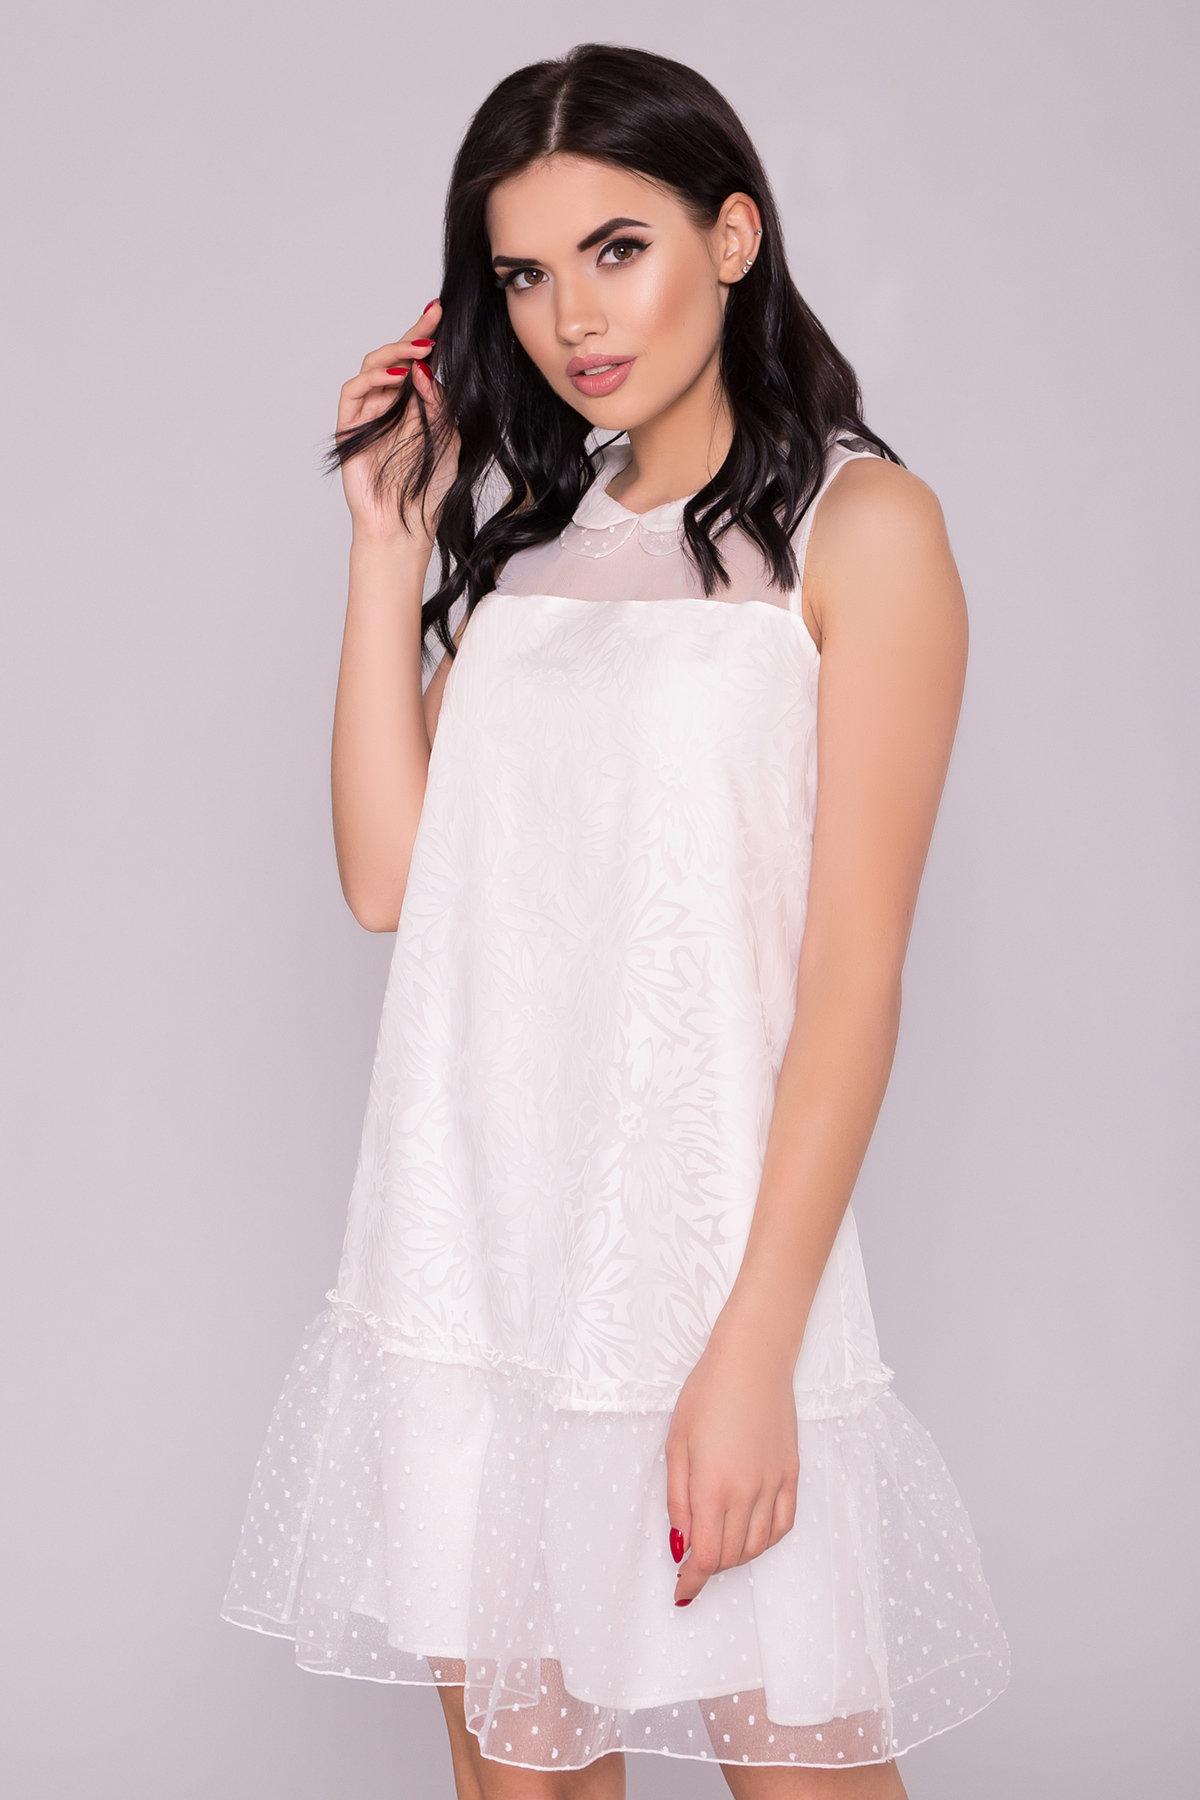 Платье Манила 6978 Цвет: Молоко/мушка/Молоко